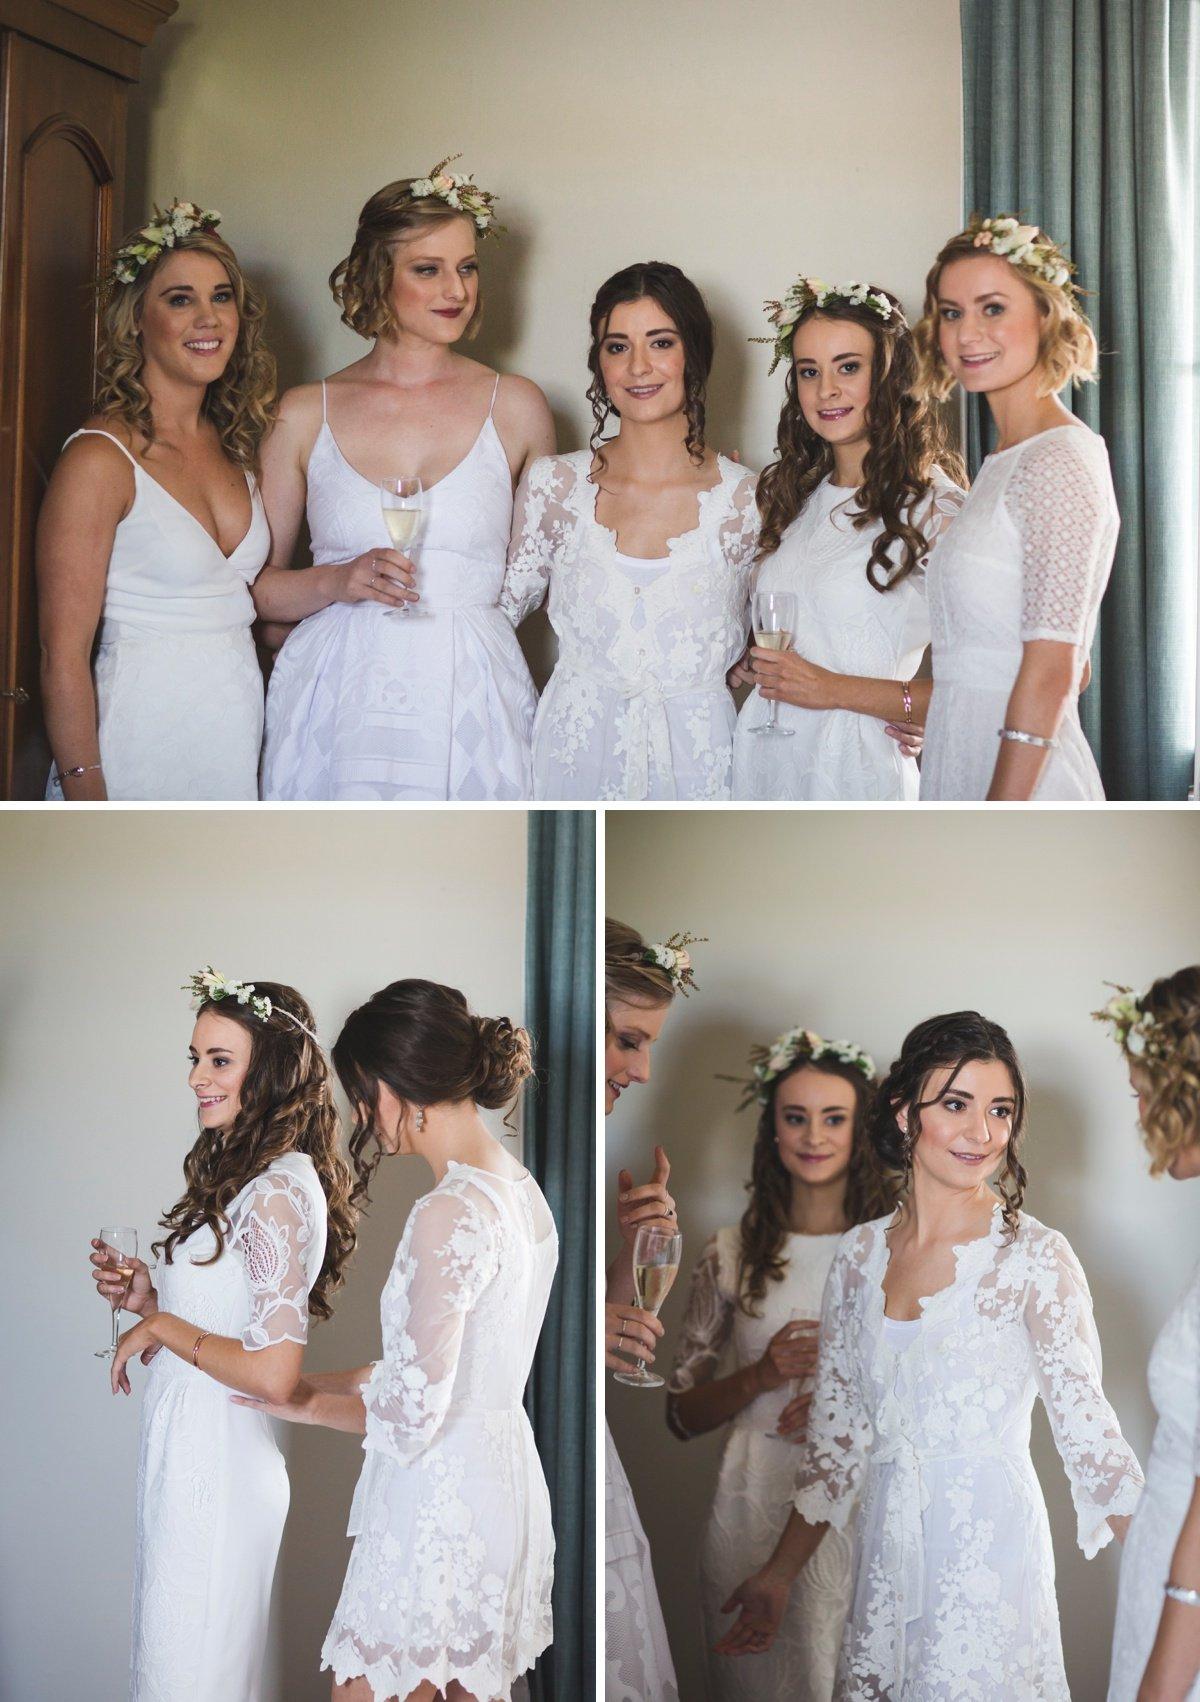 Orange Grove Garden wedding Albury wedding photographer by Peppermint Studios Tina Bingham wagga wedding photographer_0212